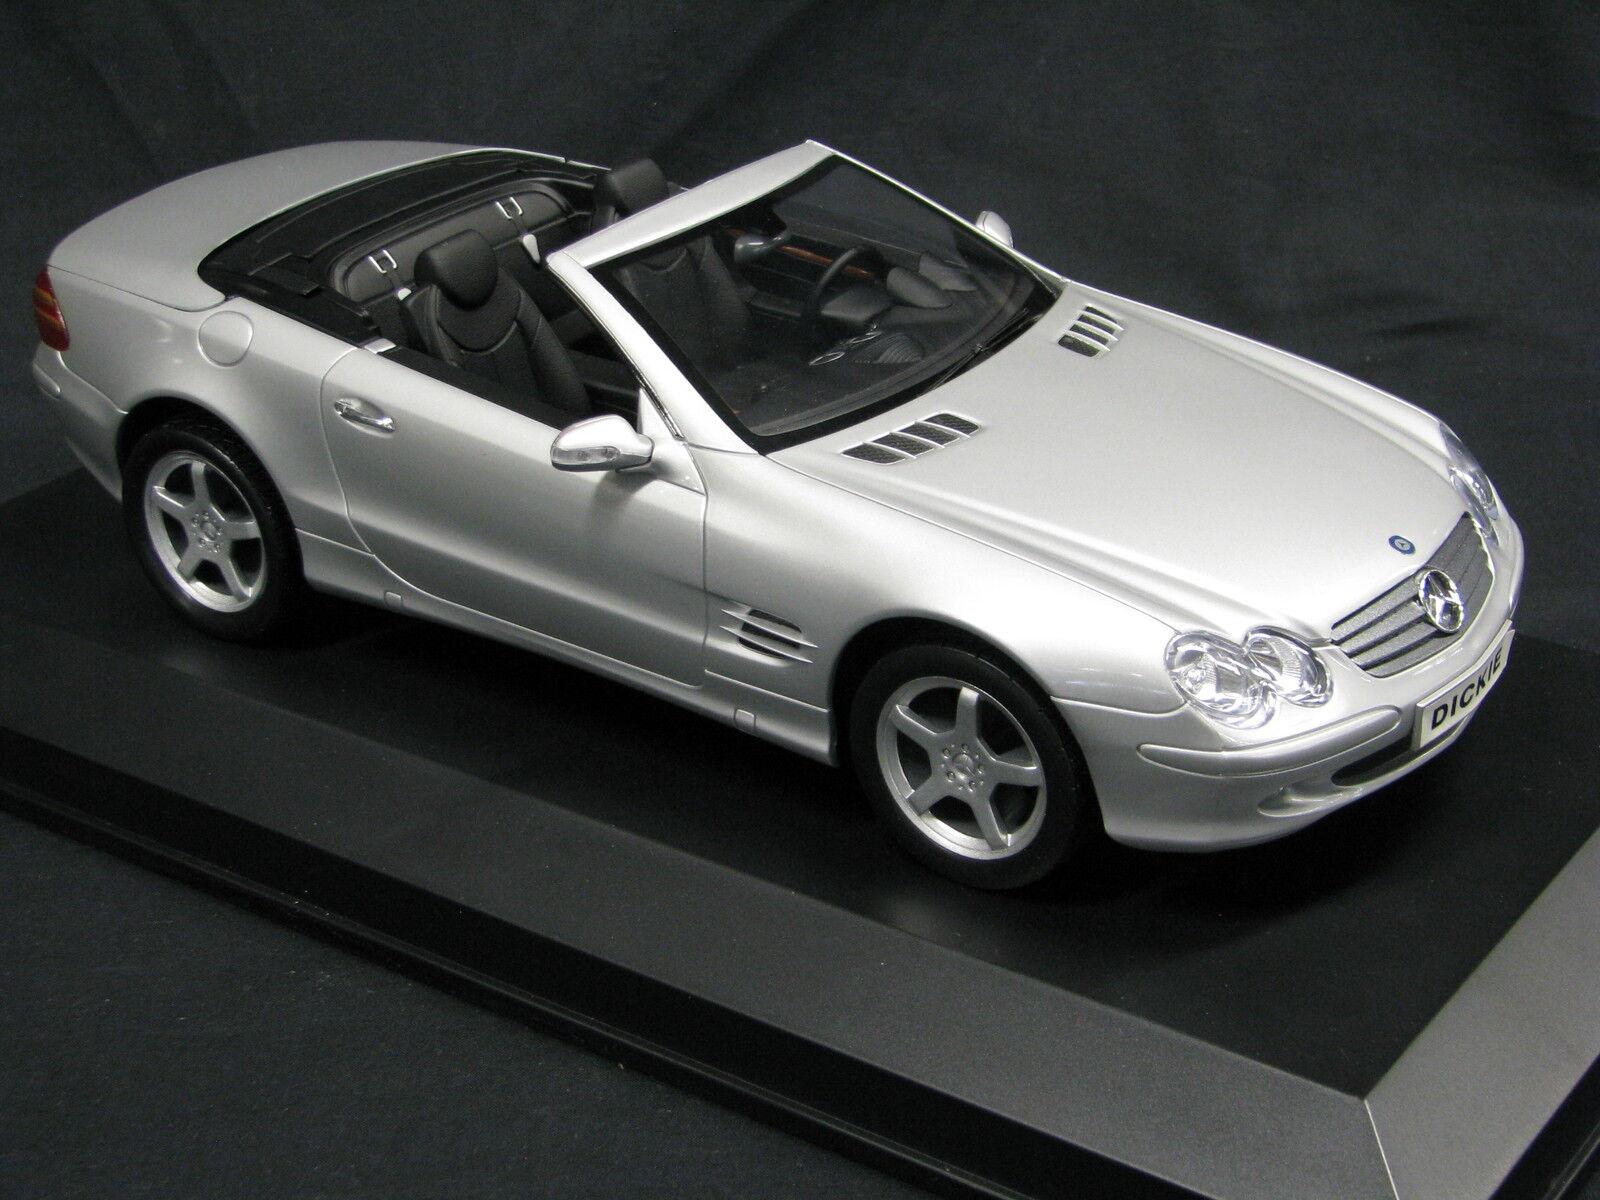 Dicky Mercedes SL converdeible 1  12 plata